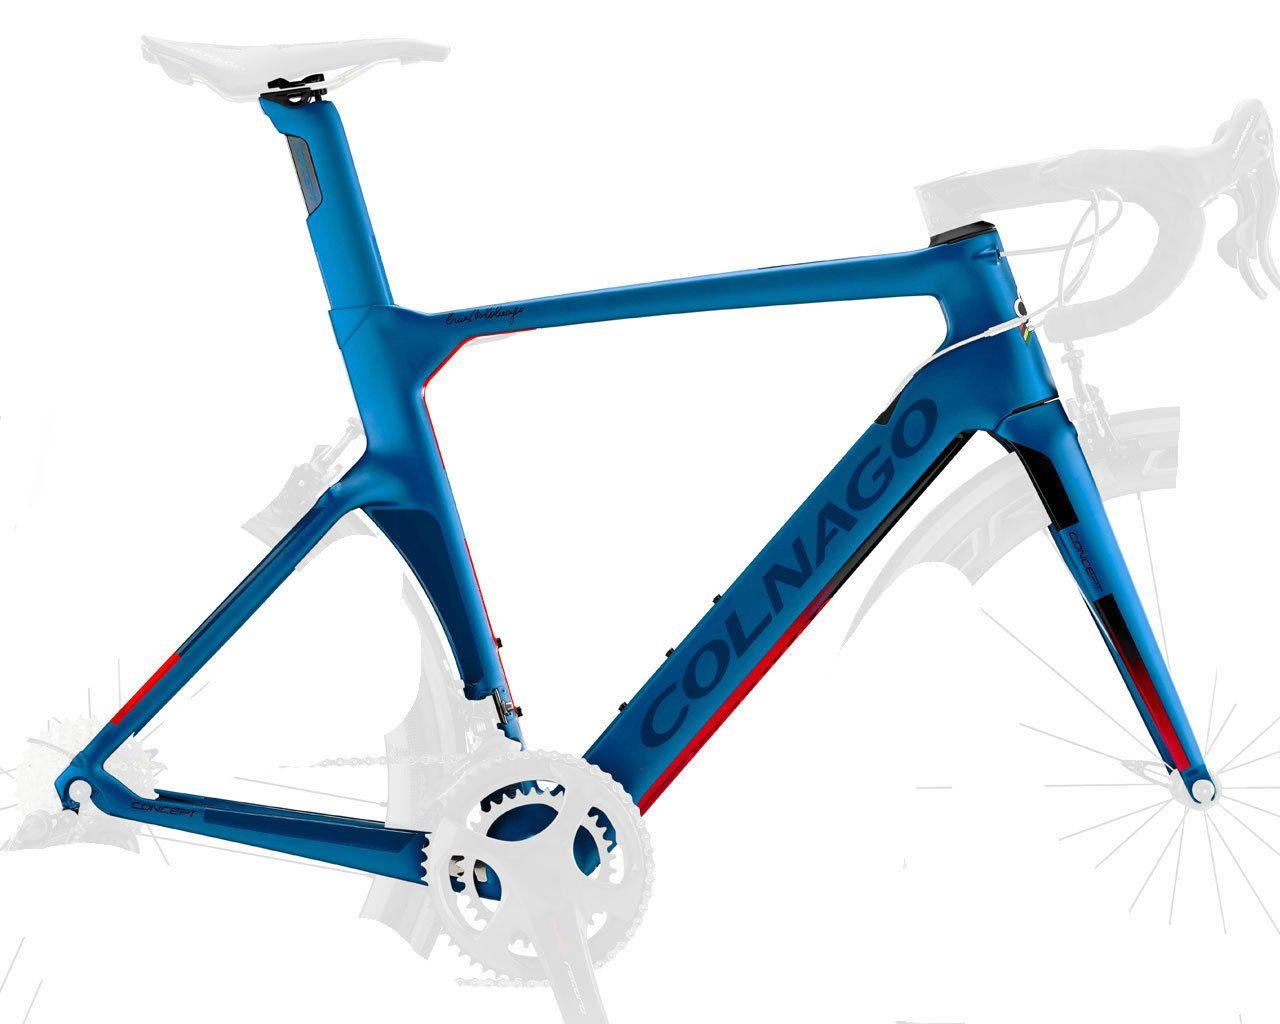 Colnago Concept Disque Cadreset NJbl Blue Cadre Matte Cadre Carbon Cadres de Vélo Cadre Cadre de vélo de carbone 2021